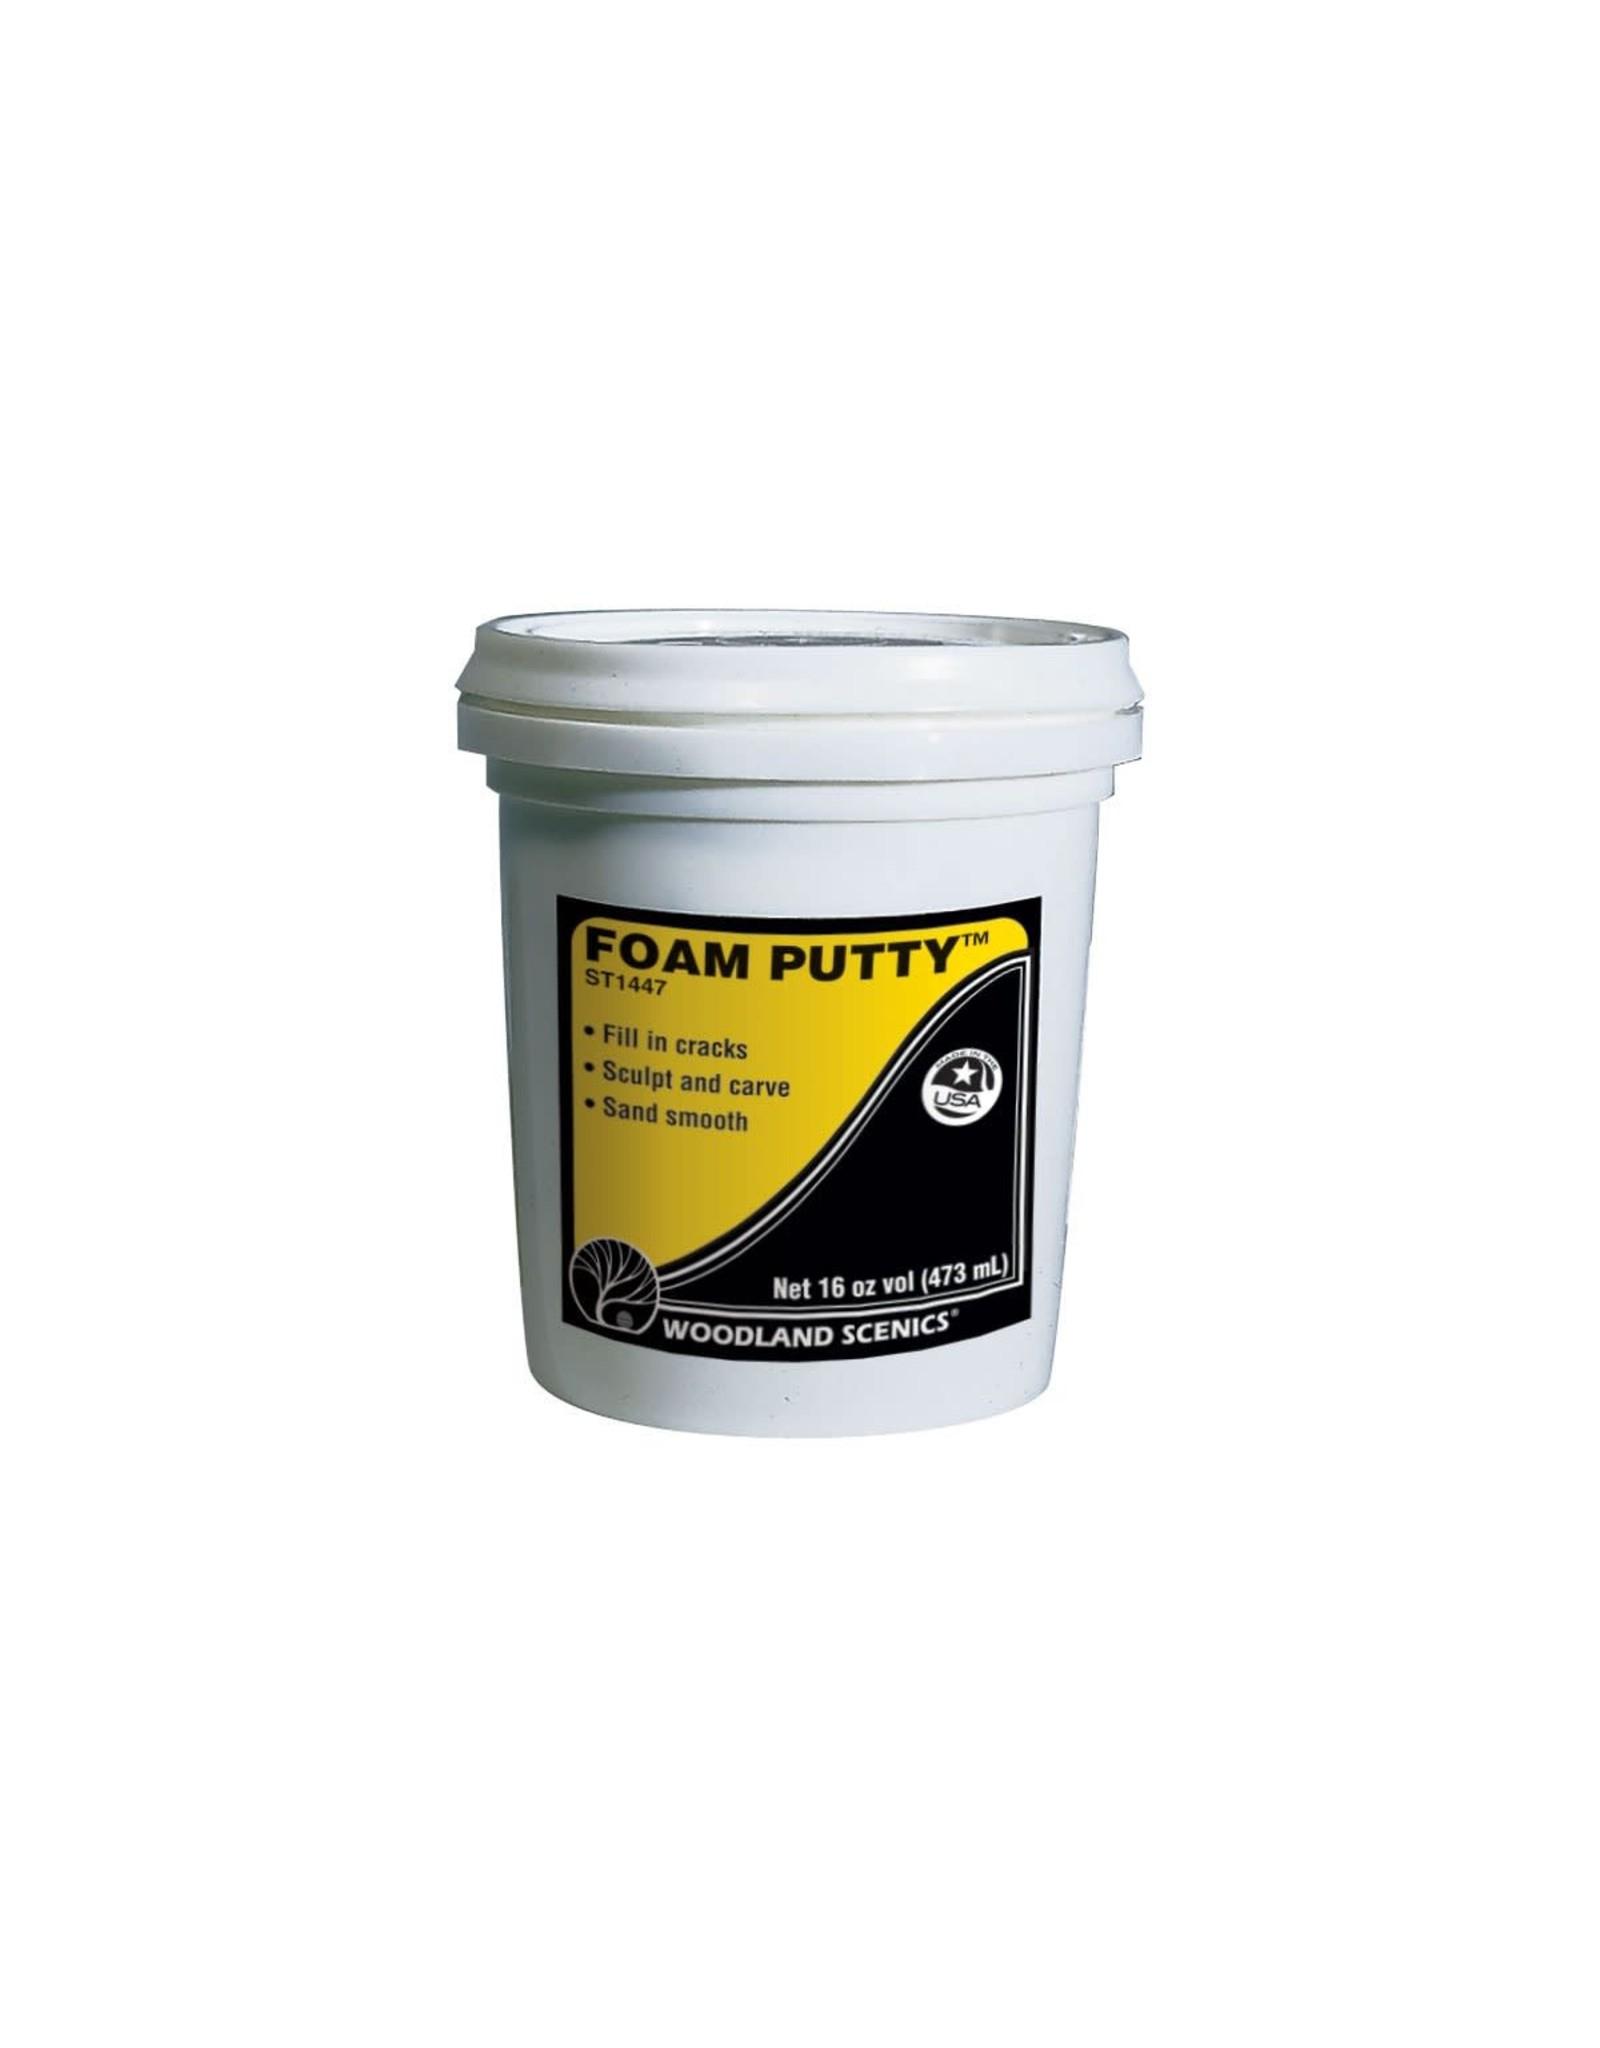 Woodland Scenic Foam Putty™